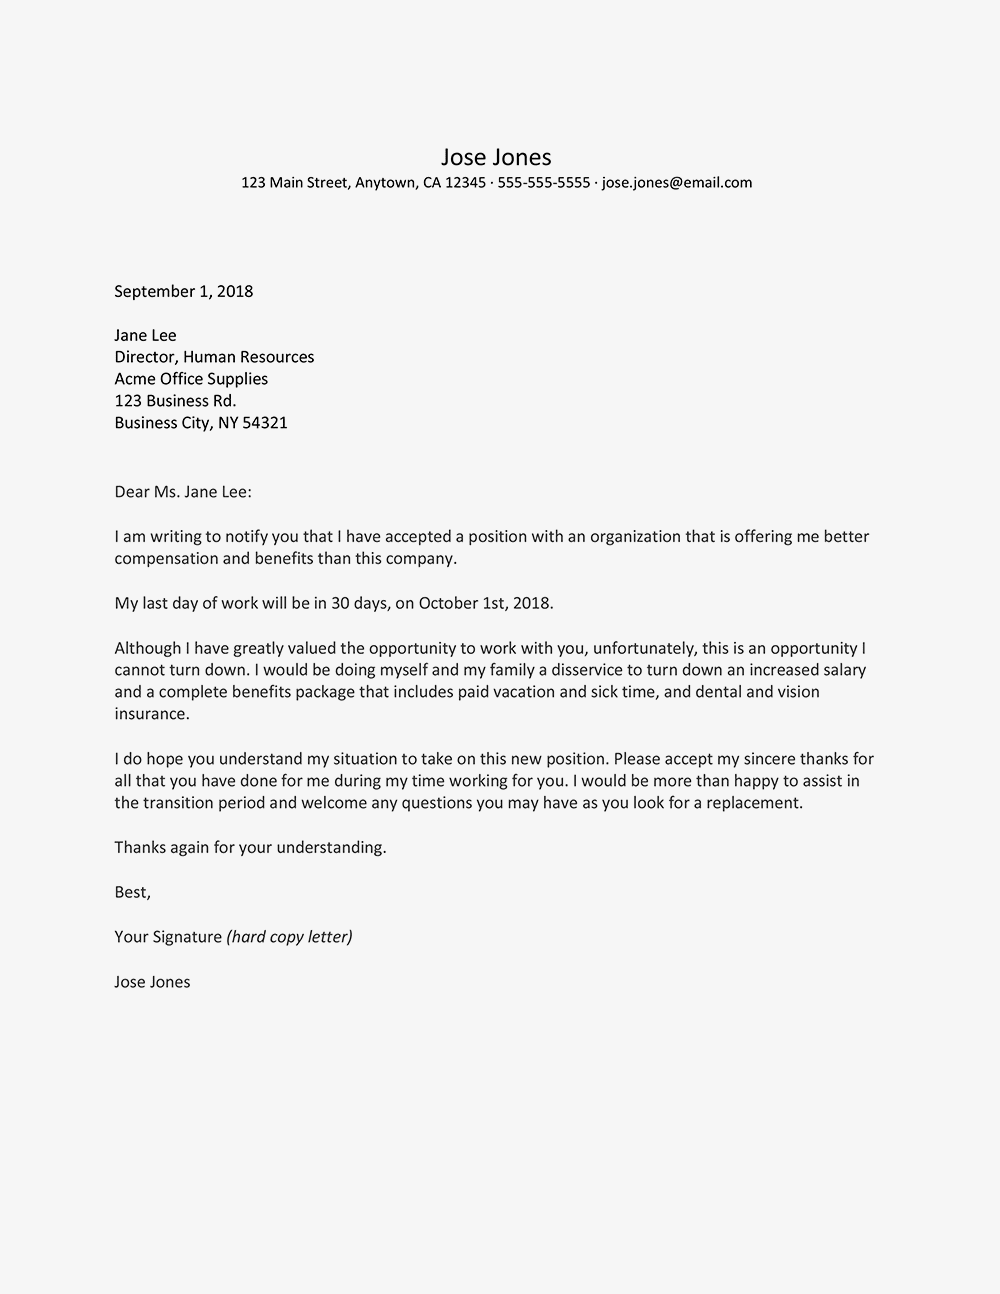 Sample Letter Housing Allowance Request Employer